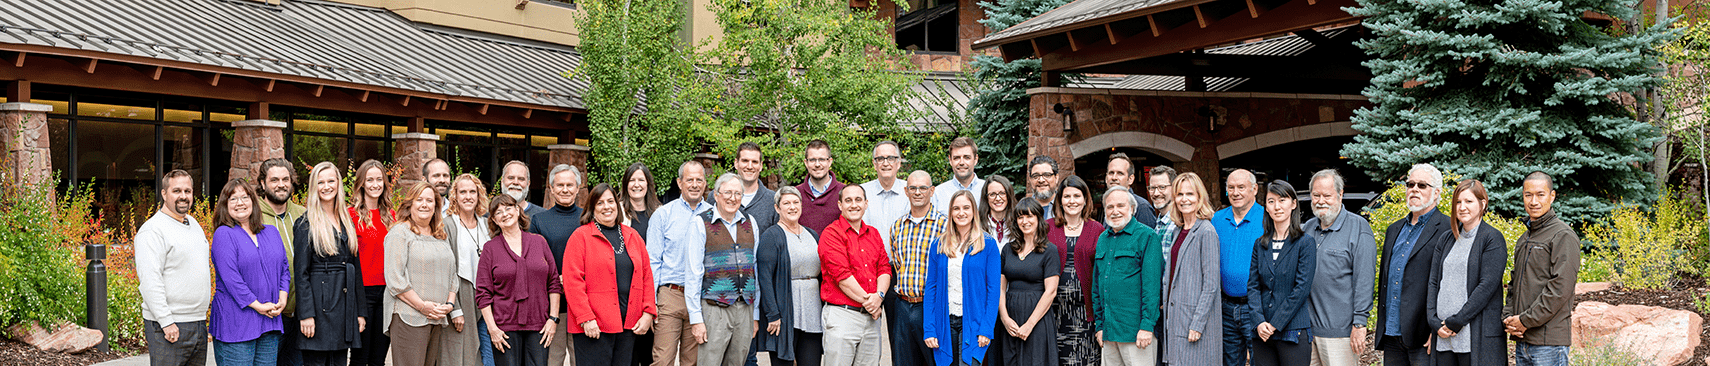 Caveon Staff and Leadership Team | Company - Caveon Test Security